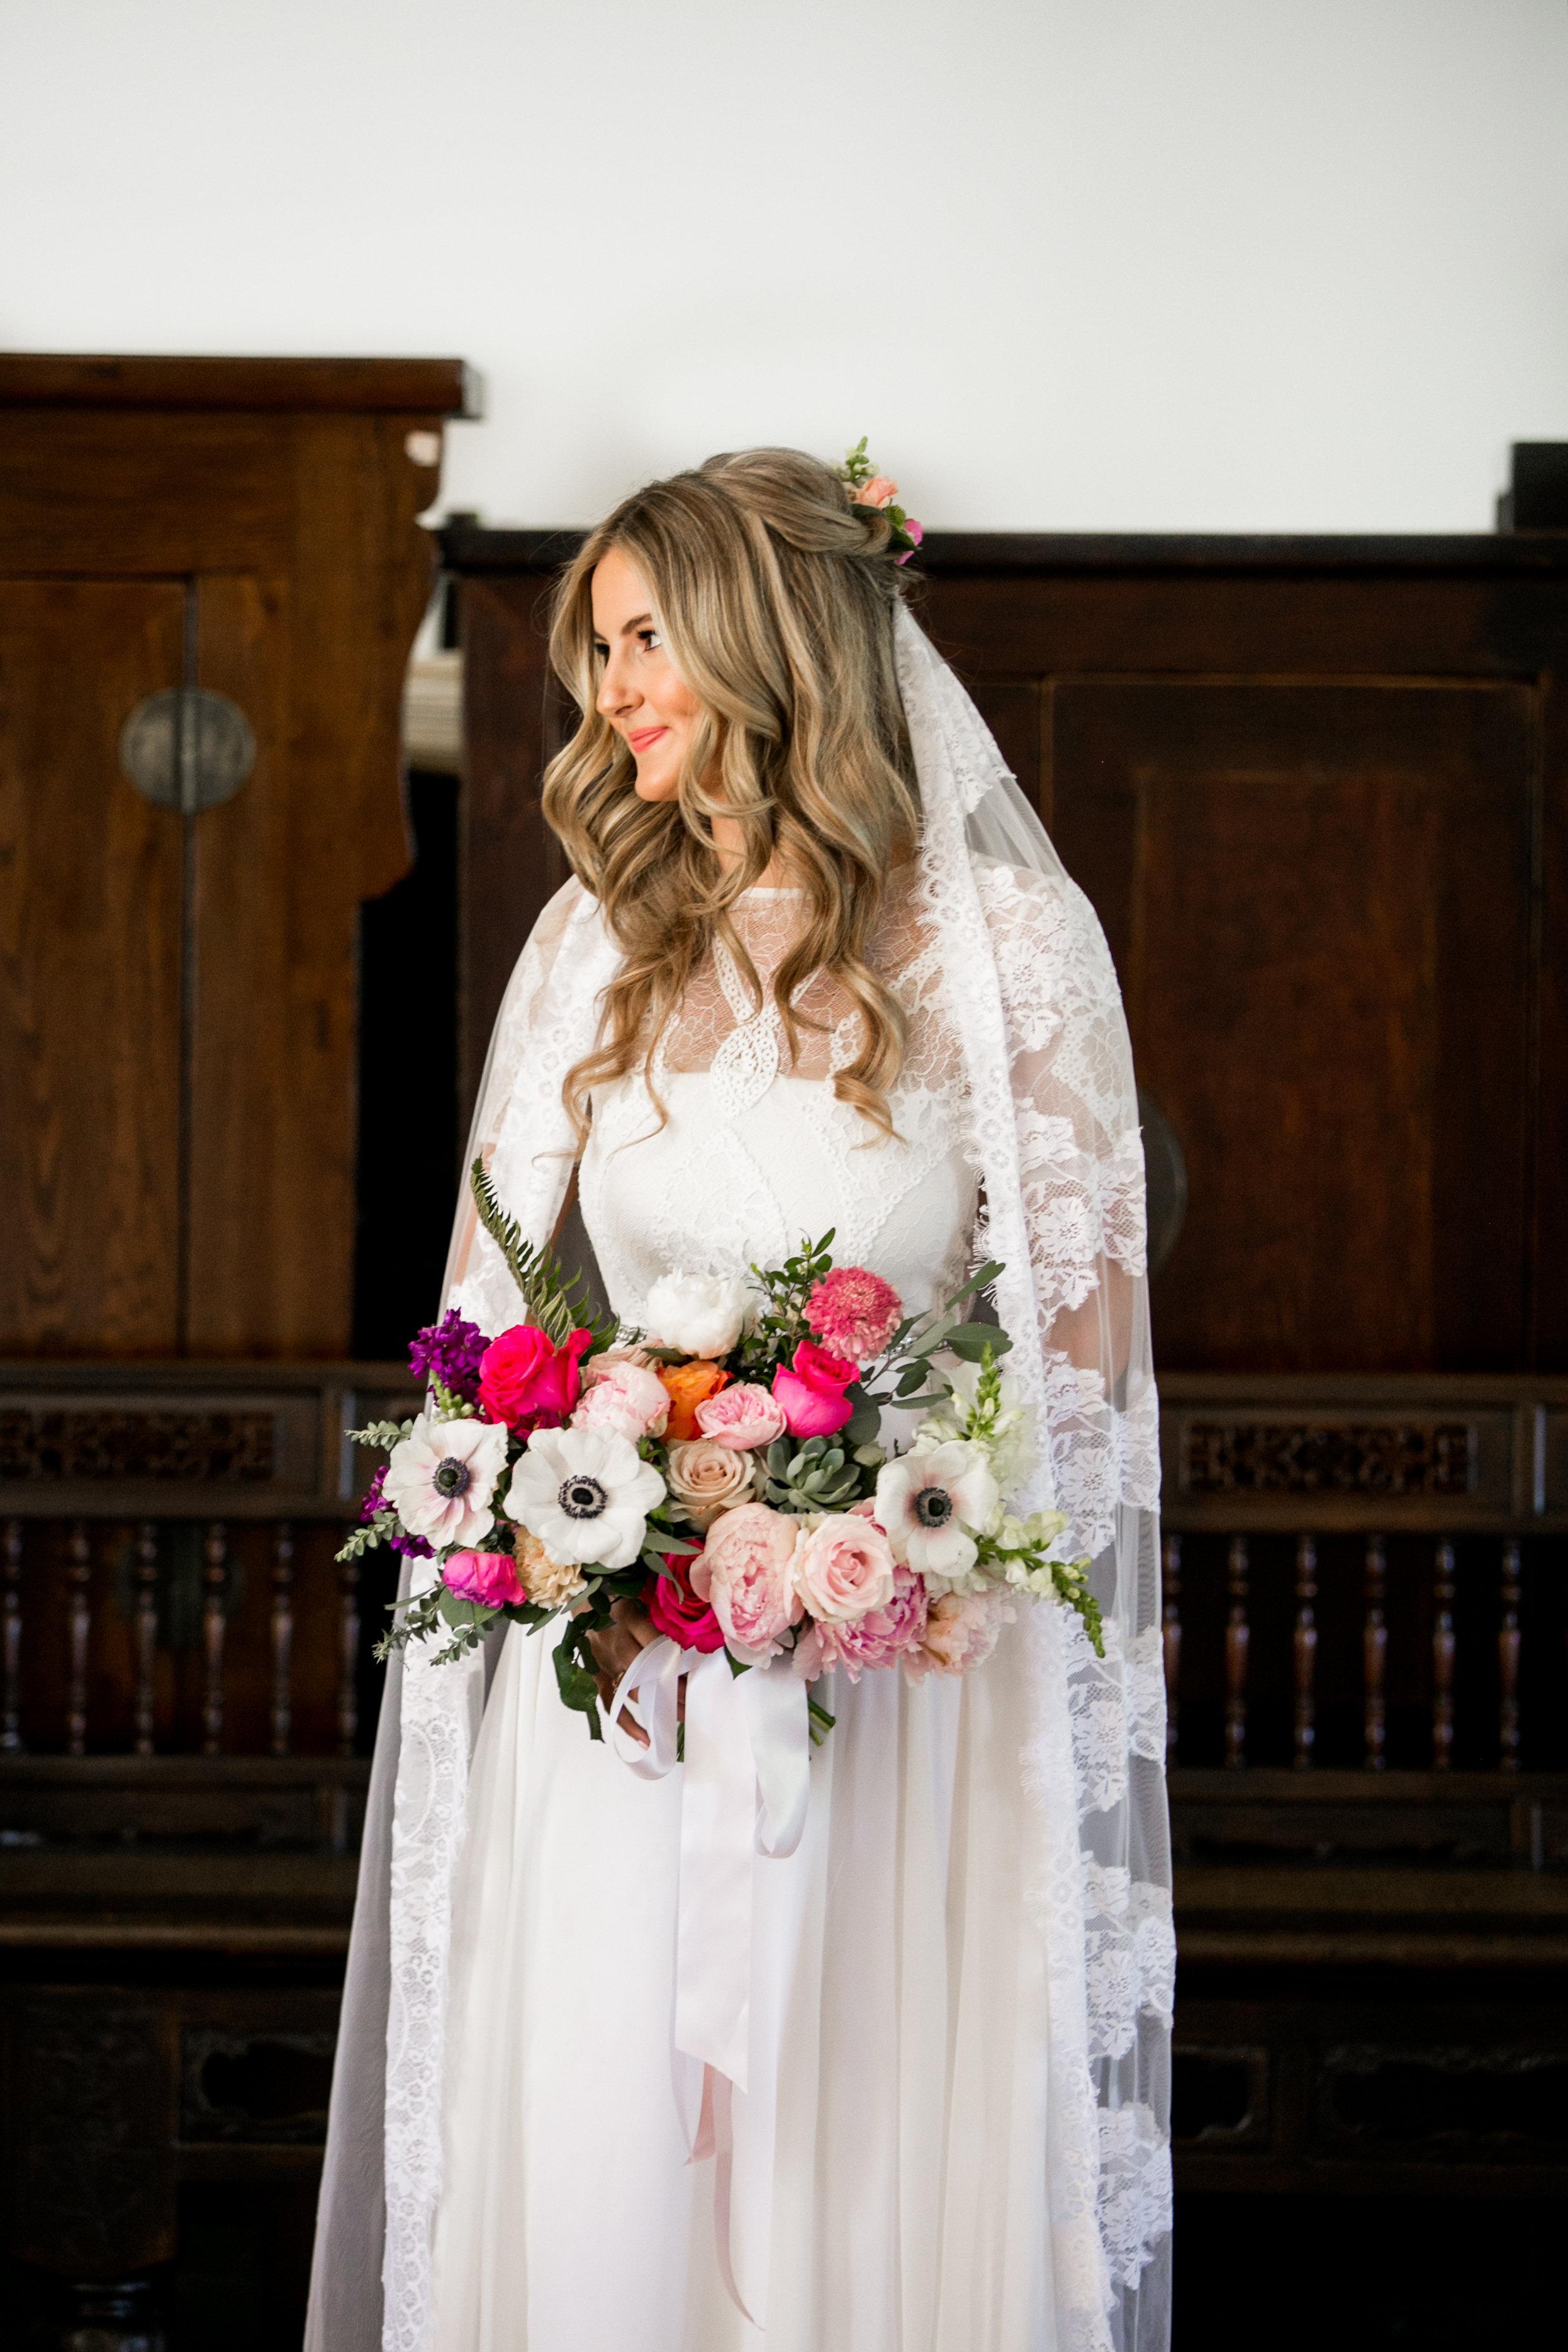 Vancouver-Island-Coombs-Cuckoos-Wedding-Blush-Pink-Vibrant-Bridal-Bouquet.jpg